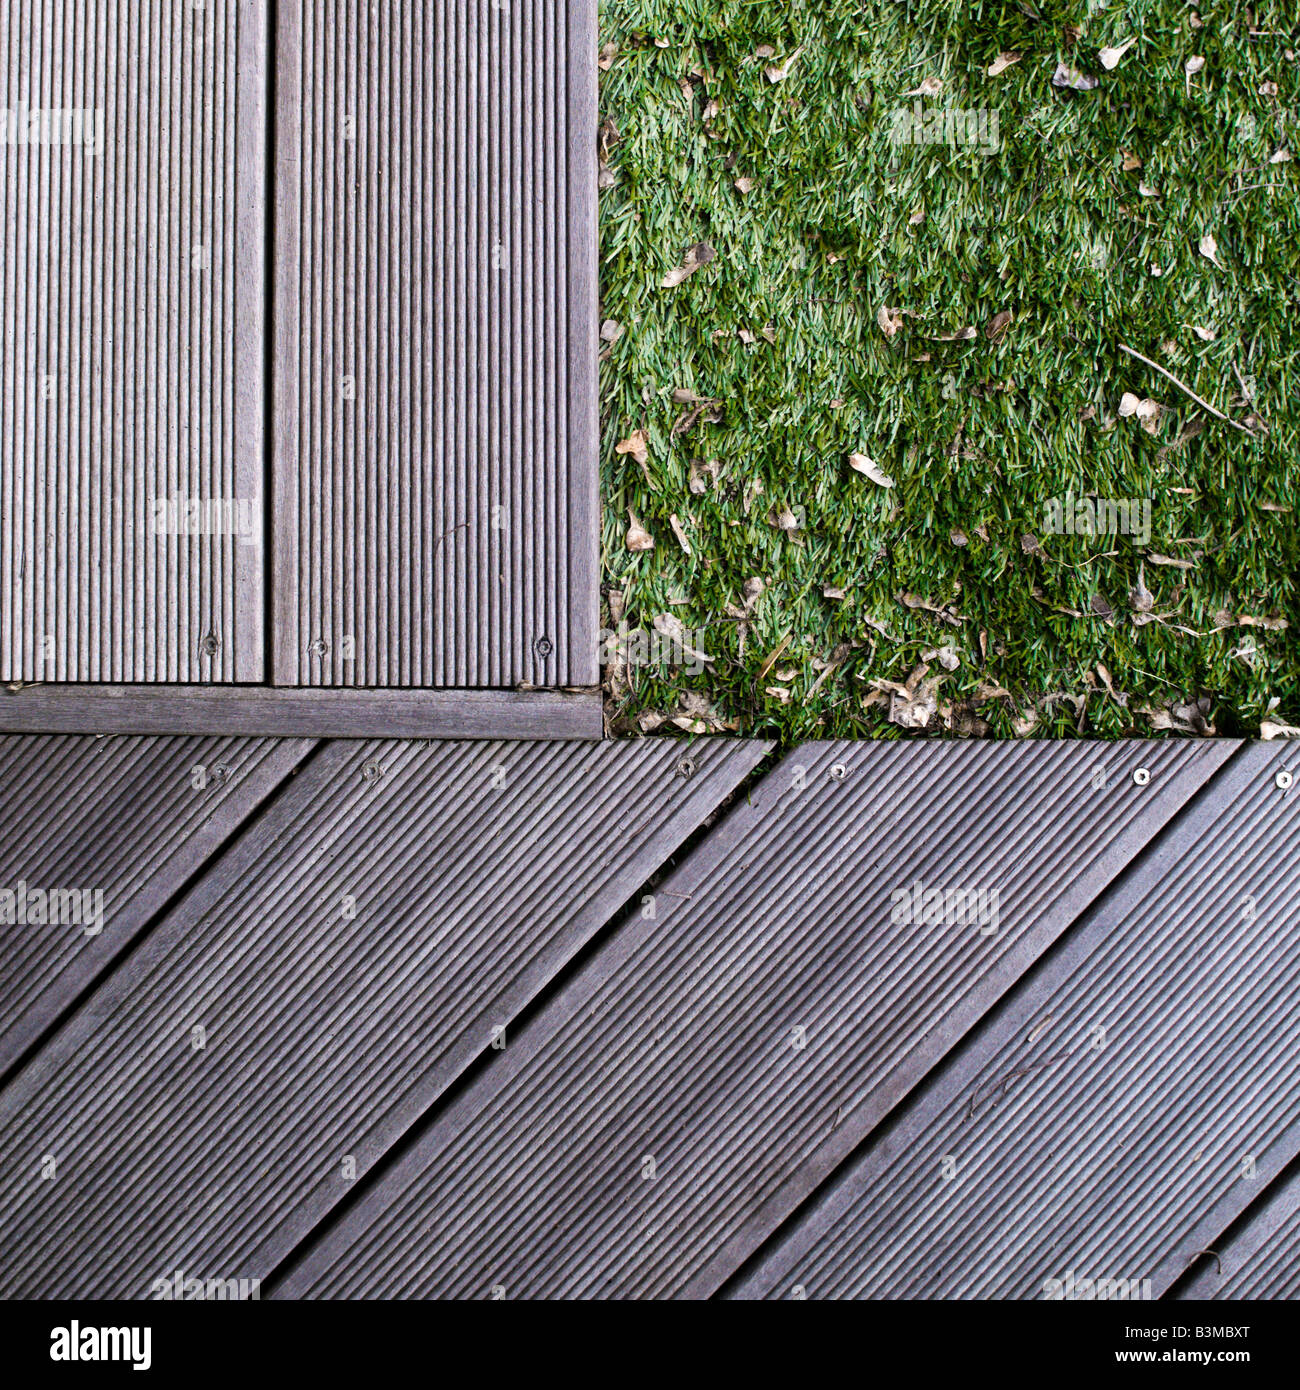 decking edges meet astro turf lawn Stock Photo